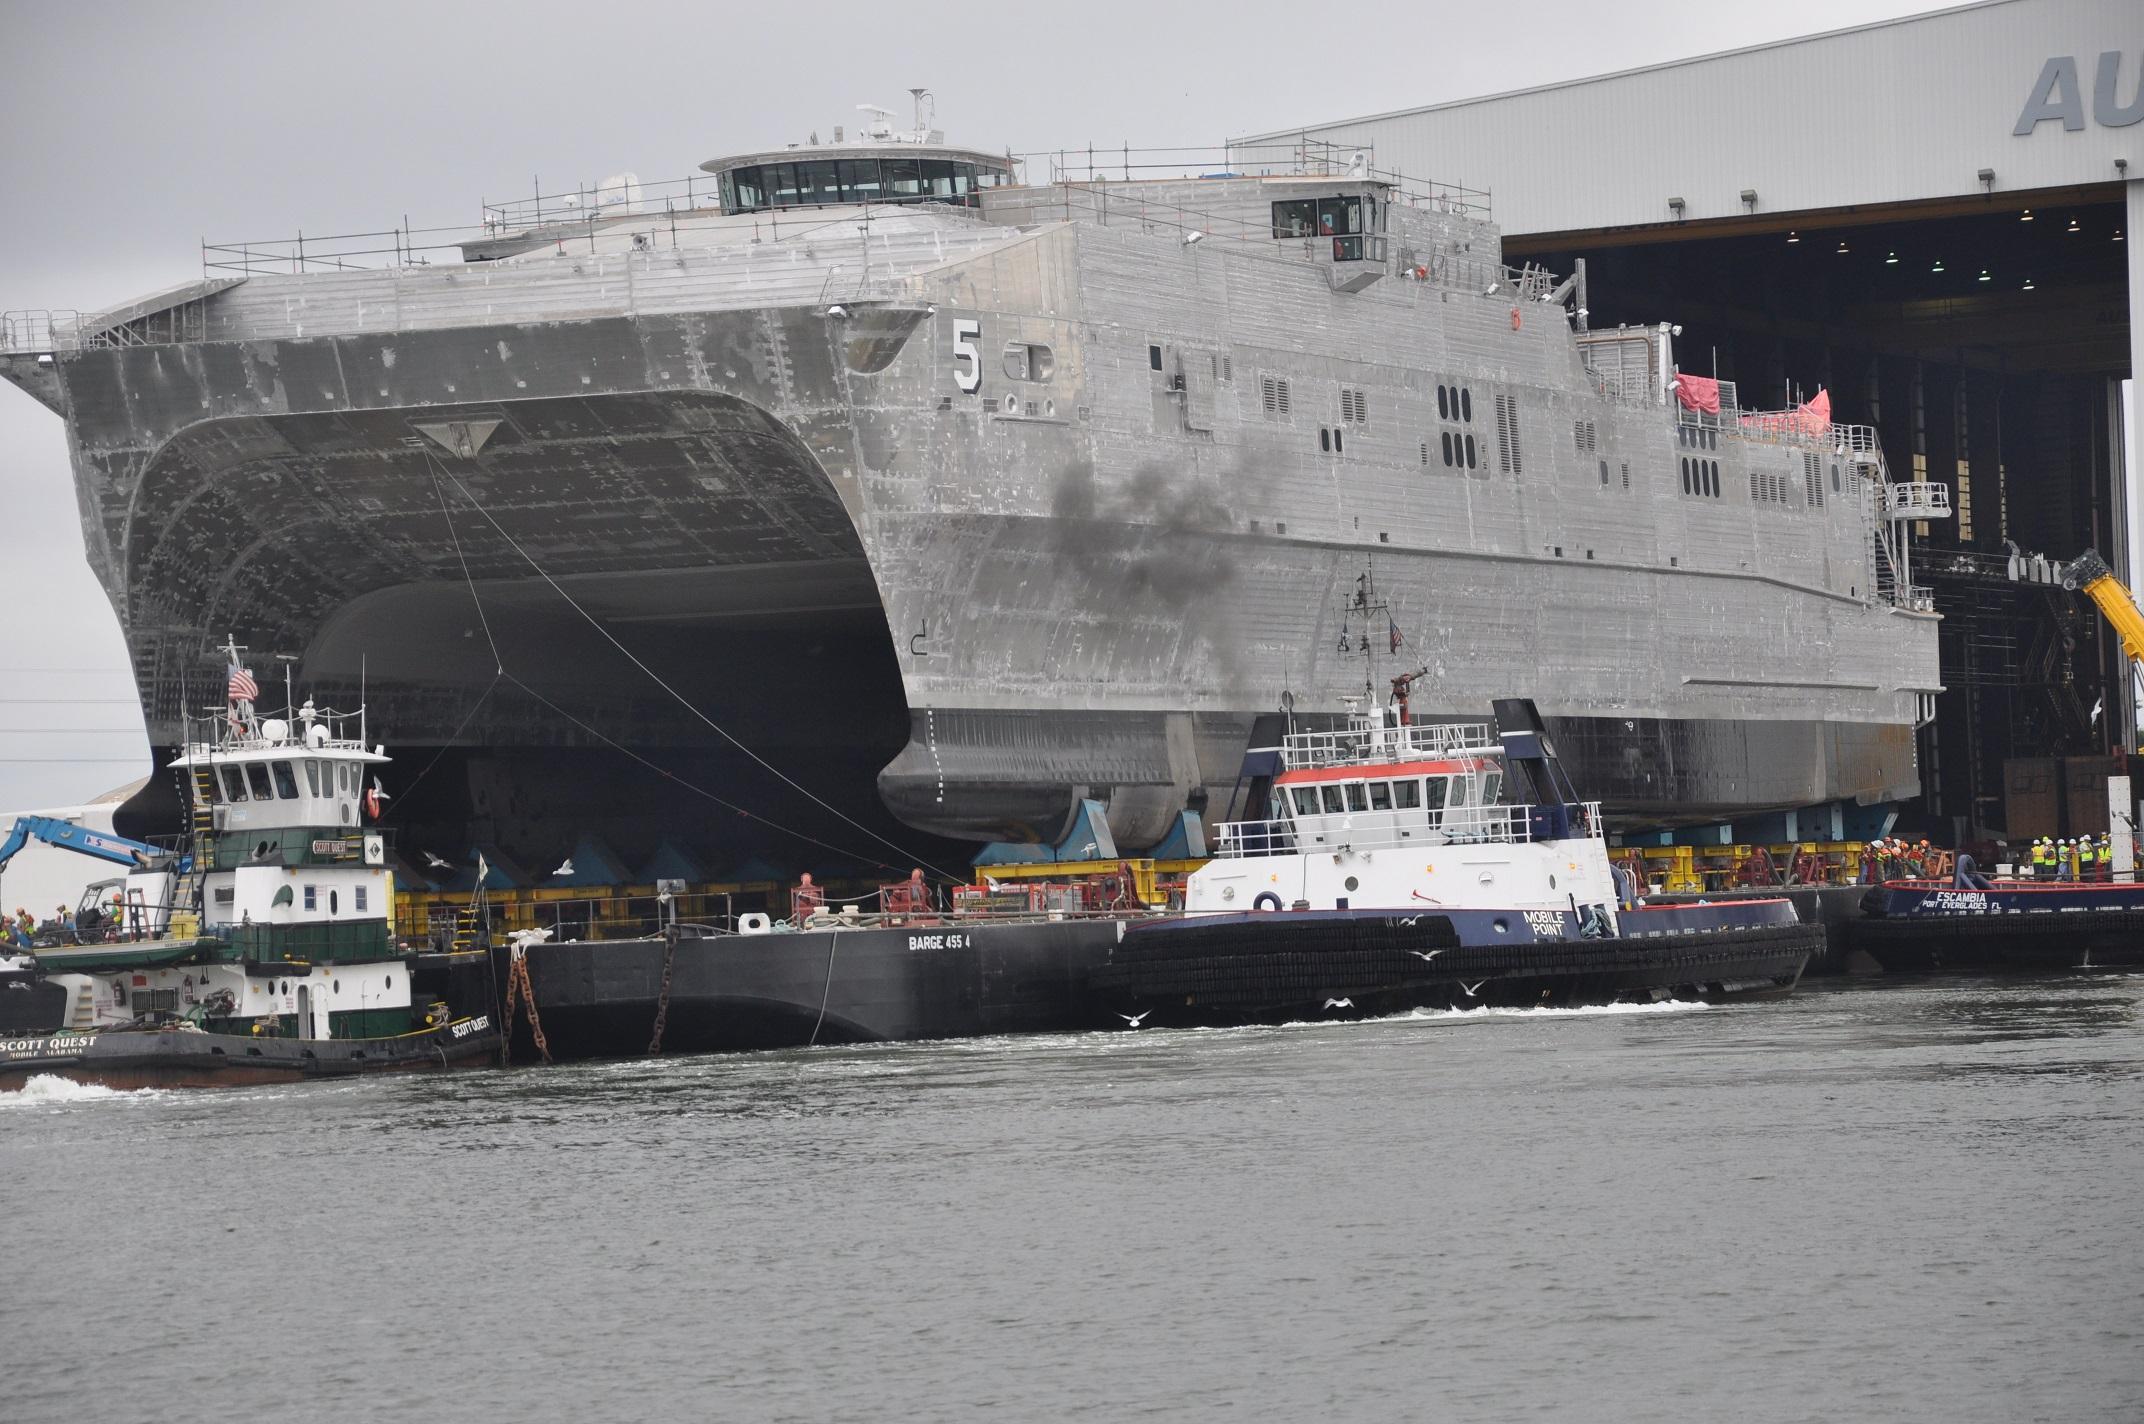 USNS TRENTON JHSV-5 am 30.09.2014 Bild: U.S. Navy